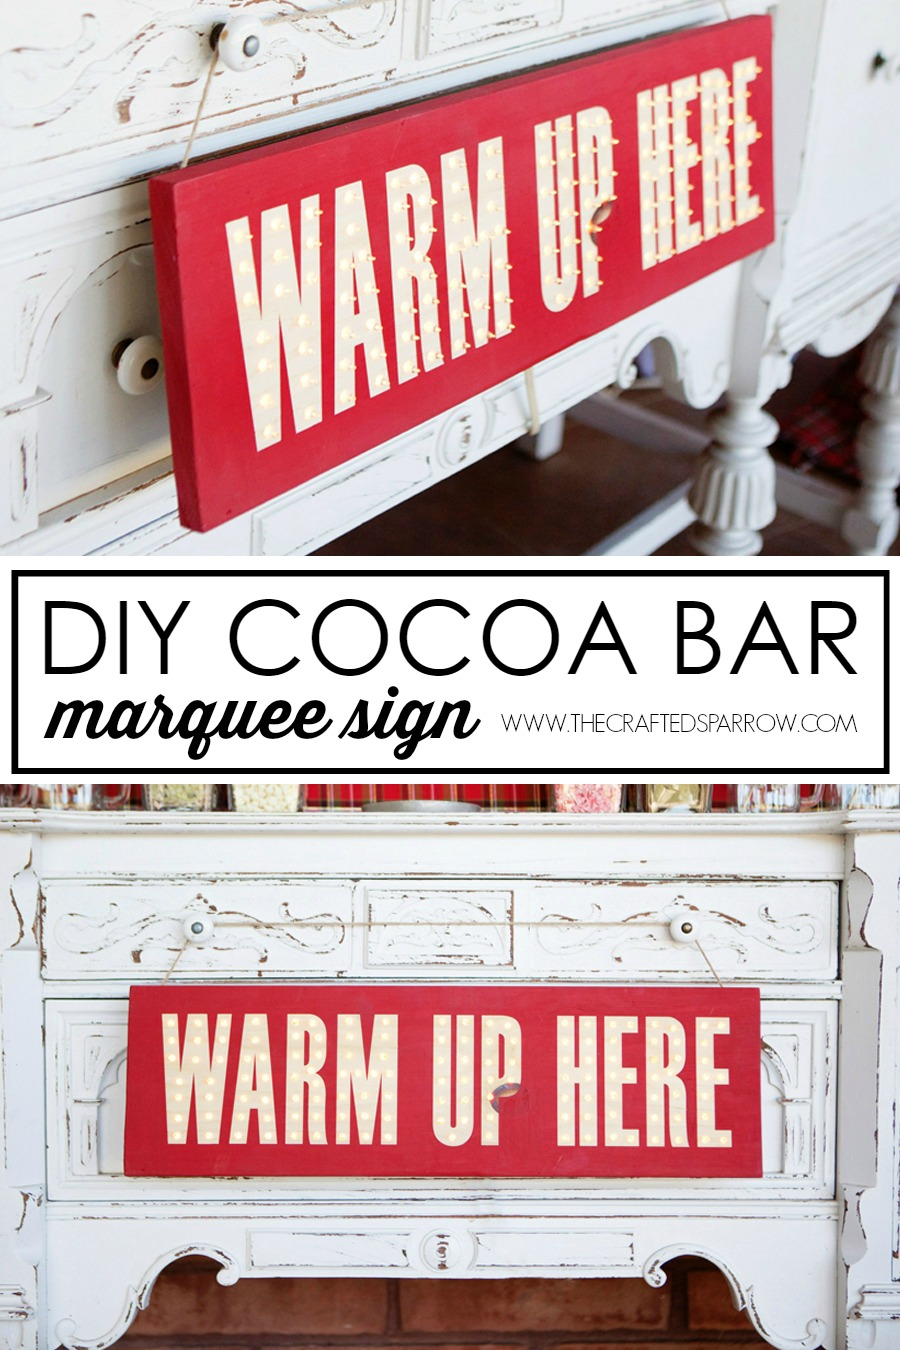 DIY Cocoa Bar Marquee Sign